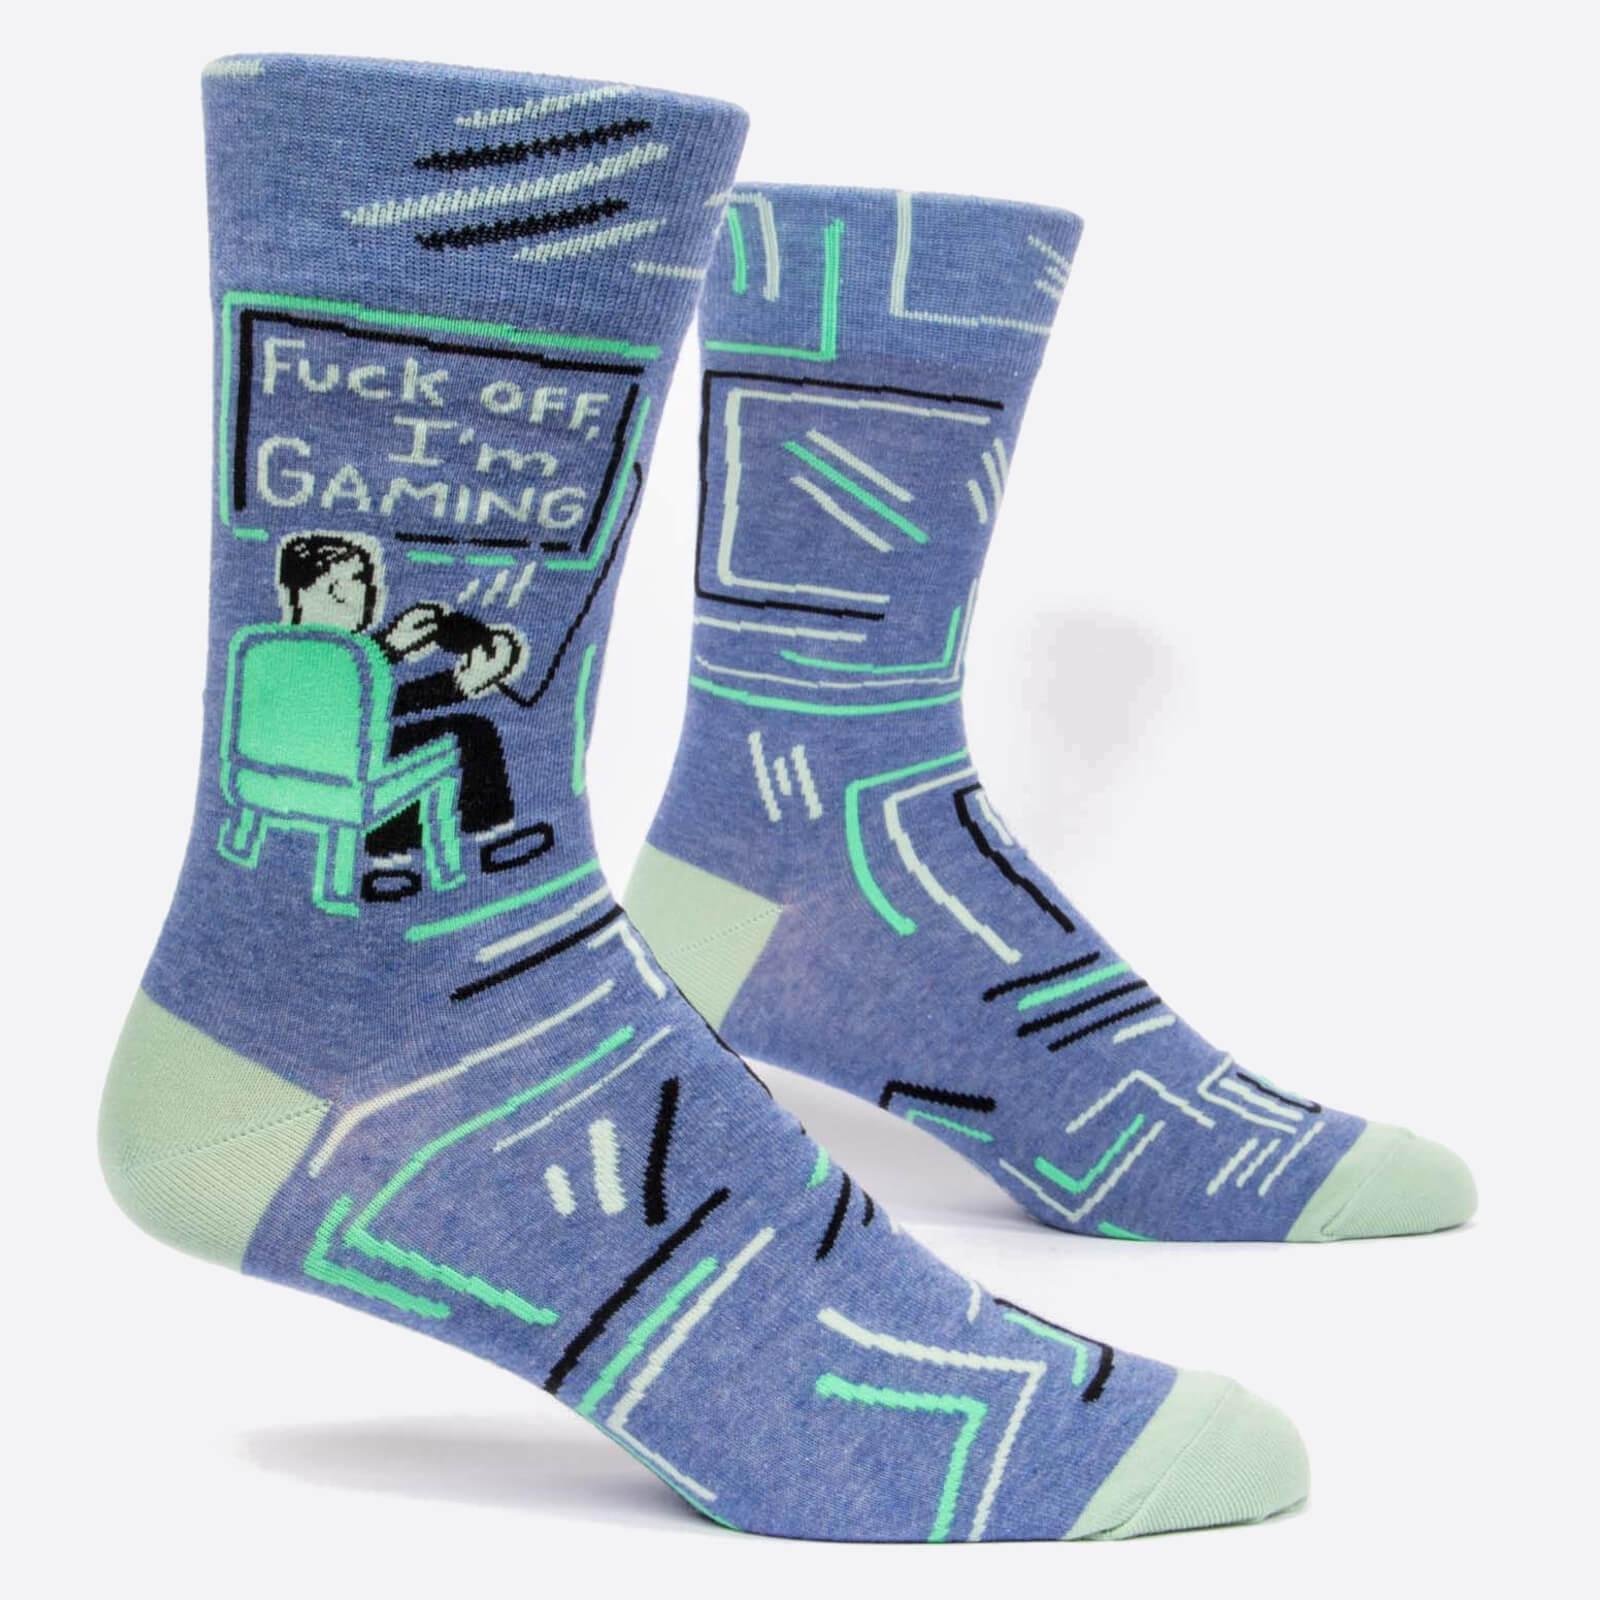 Image of F*ck Off, I'm Gaming - Men's Socks